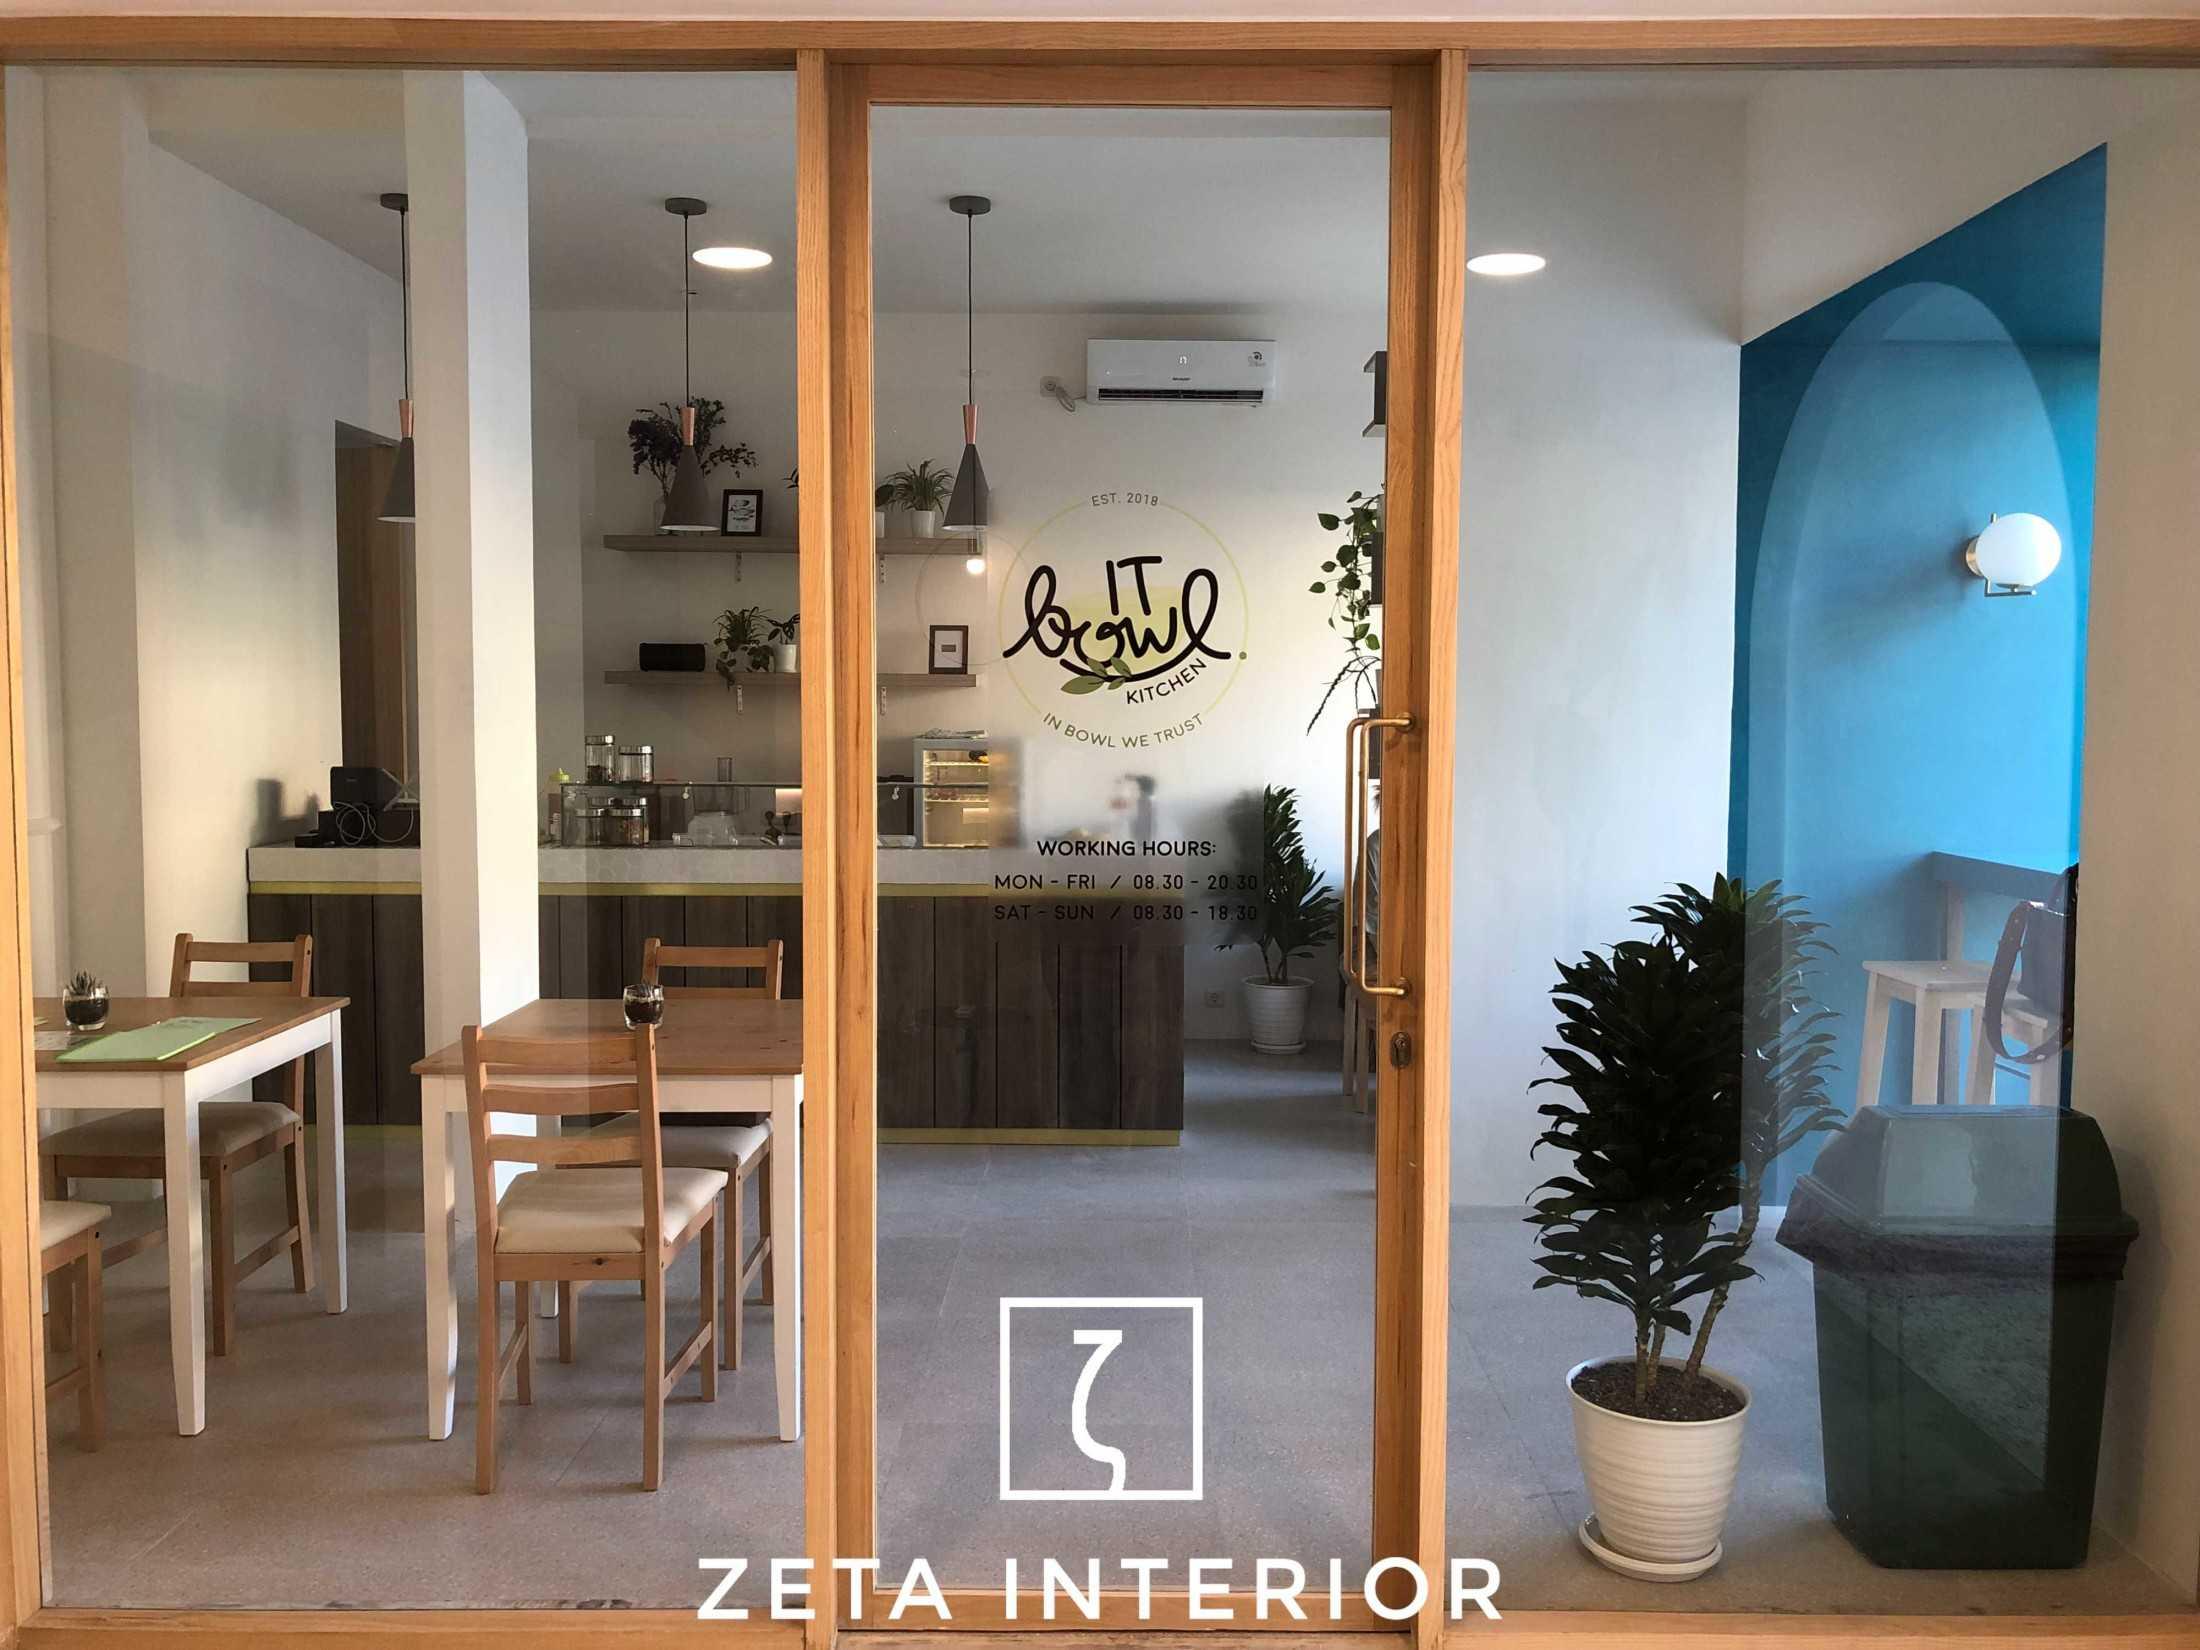 Zeta Interior Design It Bowl Kitchen Surabaya, Kota Sby, Jawa Timur, Indonesia Surabaya, Kota Sby, Jawa Timur, Indonesia Zeta-Interior-Design-It-Bowl-Kitchen  74953